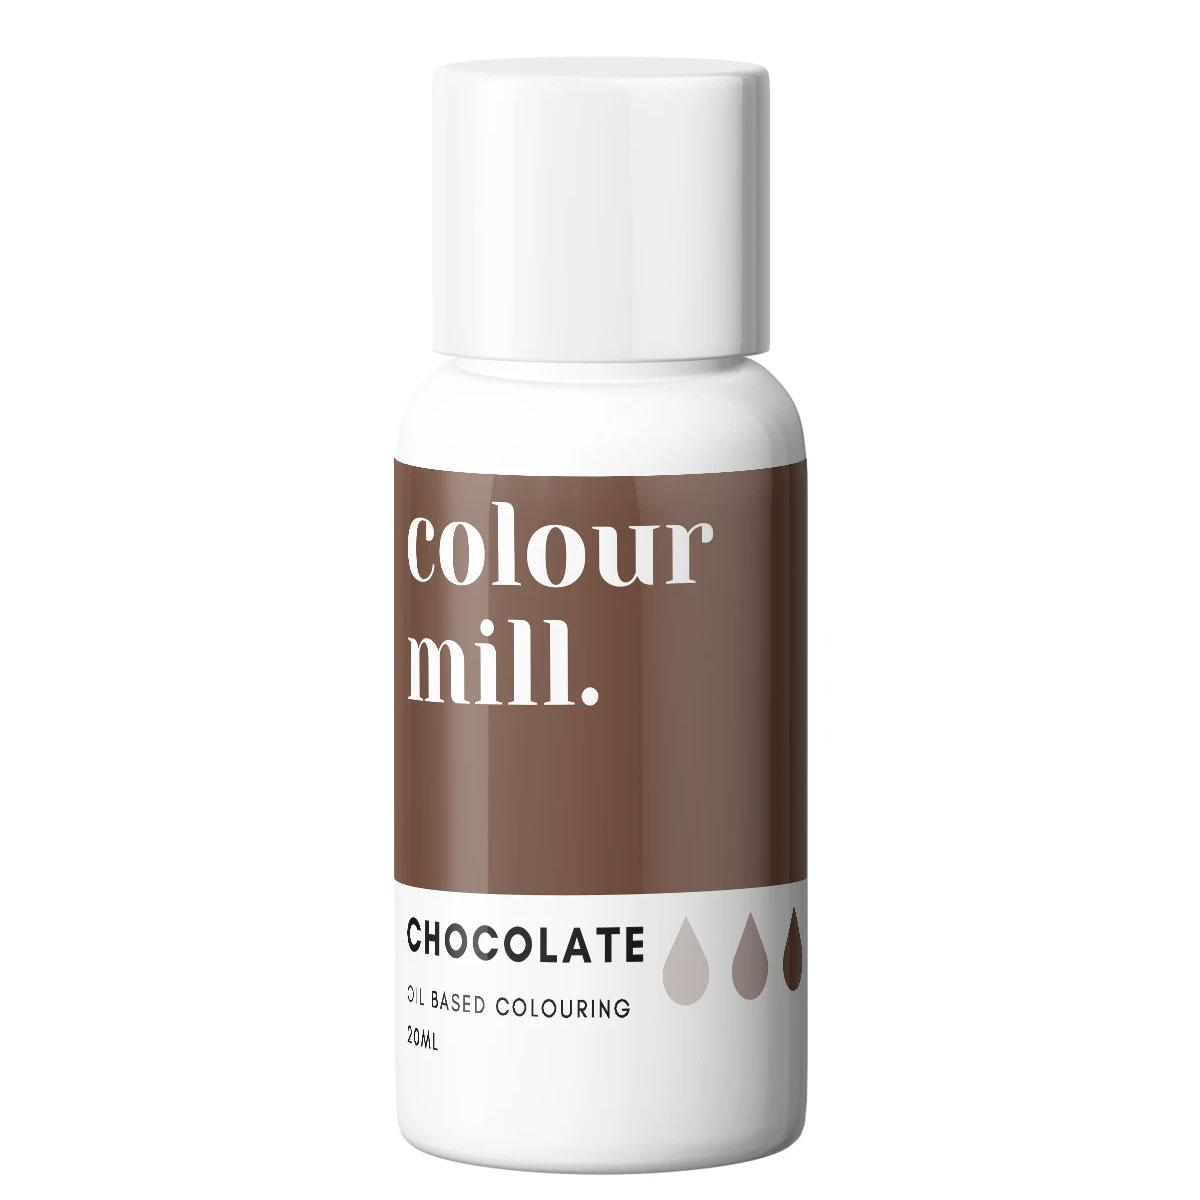 Colour Mill fettlösliche Lebensmittelfarbe - Chocolate 20ml